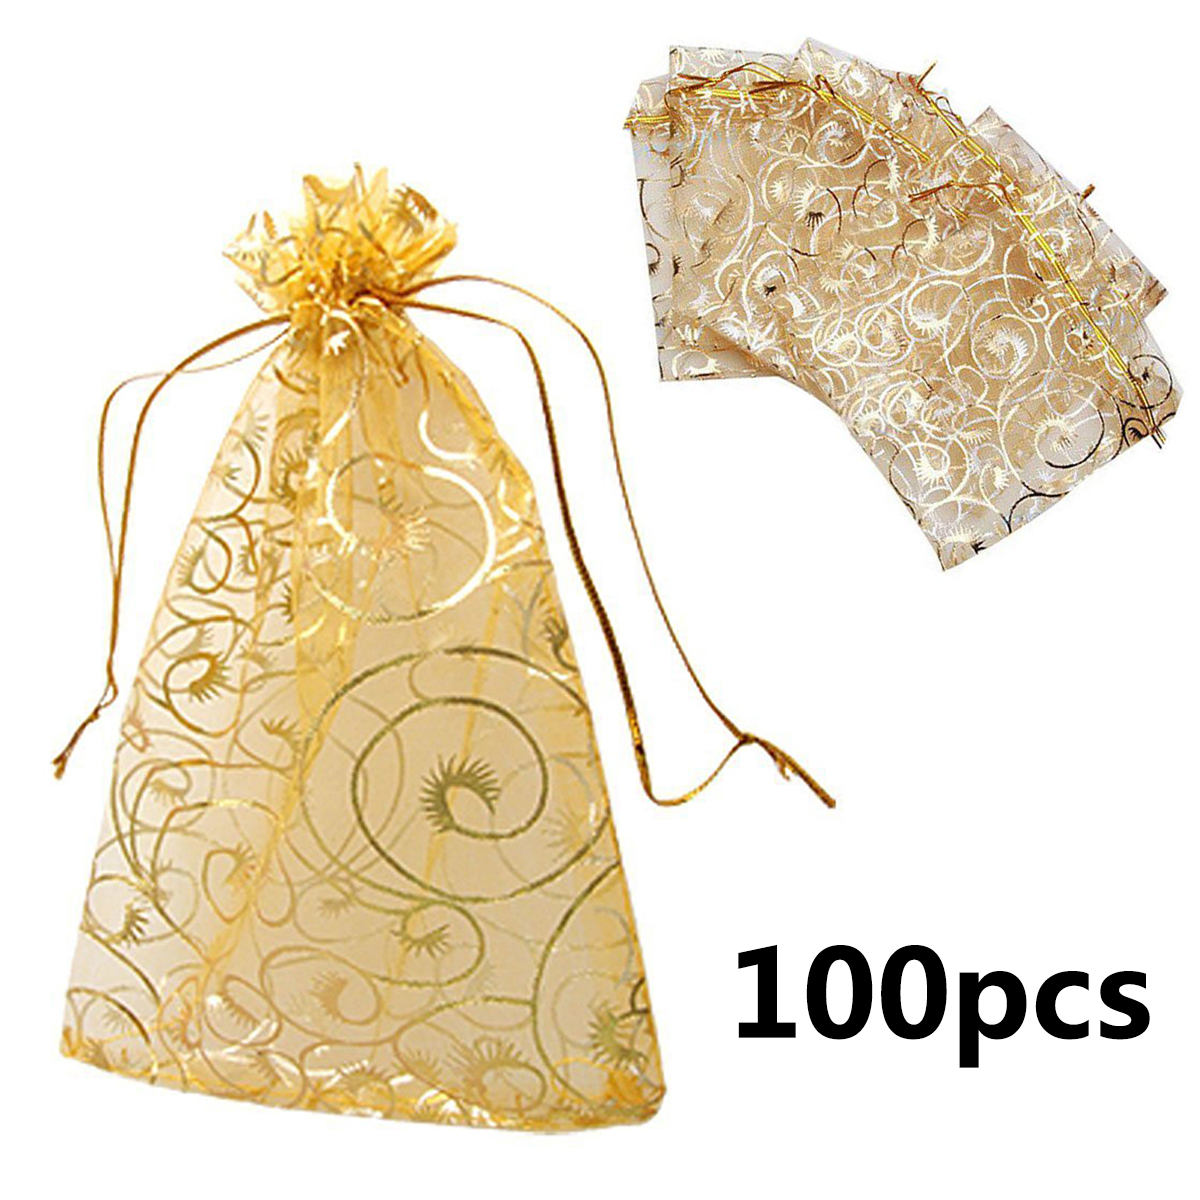 100pcs/lot Organza Bags Gold Coralline Custom Jewelry Tea Packaging Bags Organza Wedding Gift Bags Saquinho De Organza 9*12